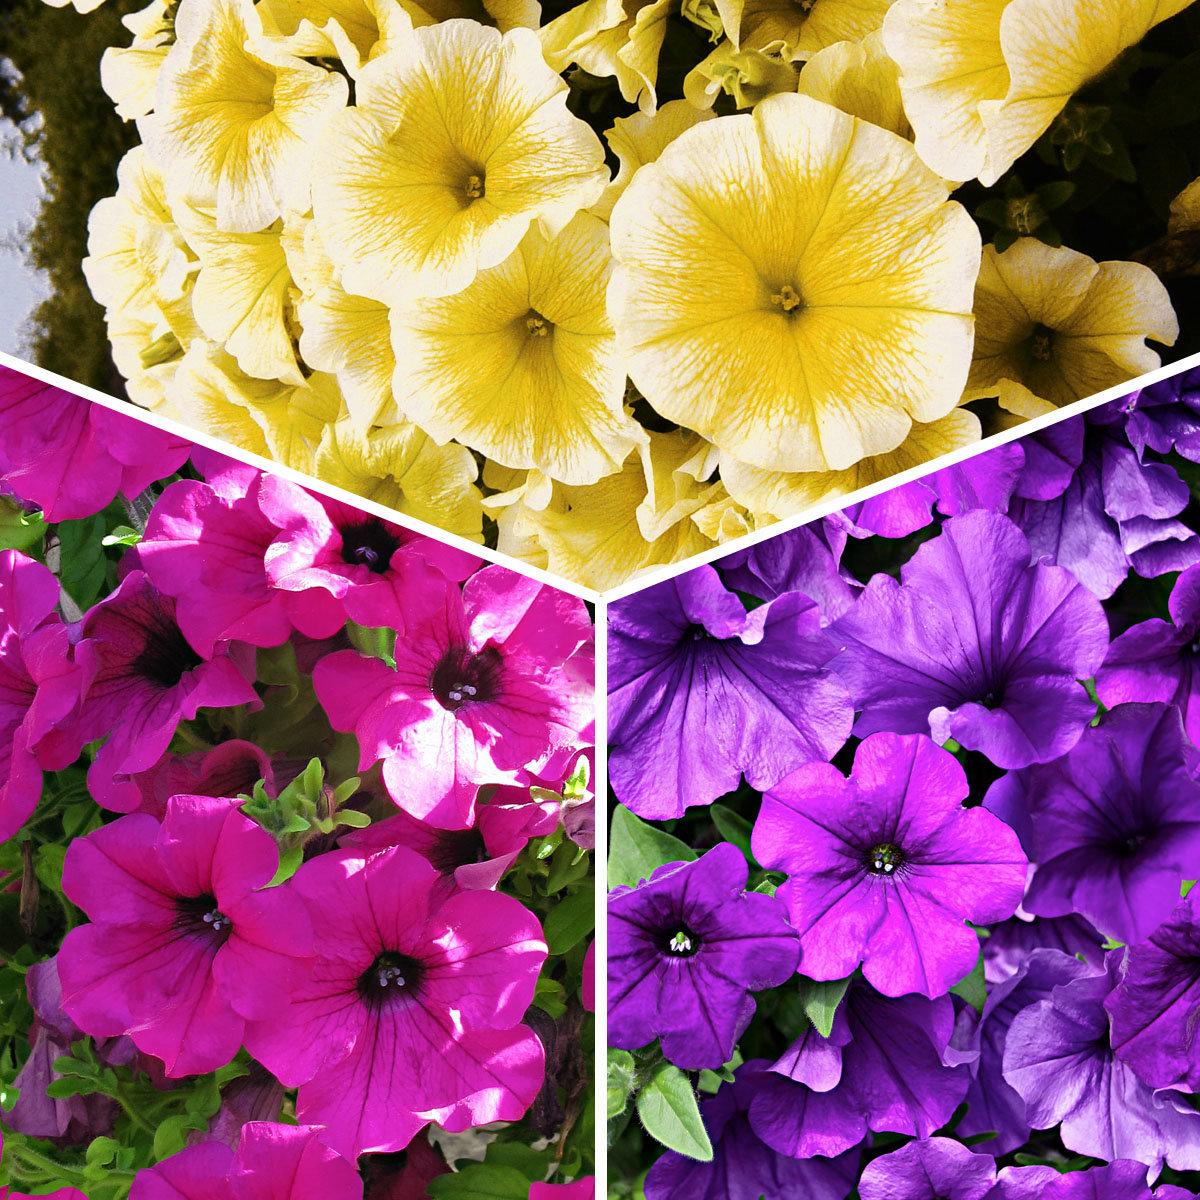 Sommerblumen-Sortiment Petunien